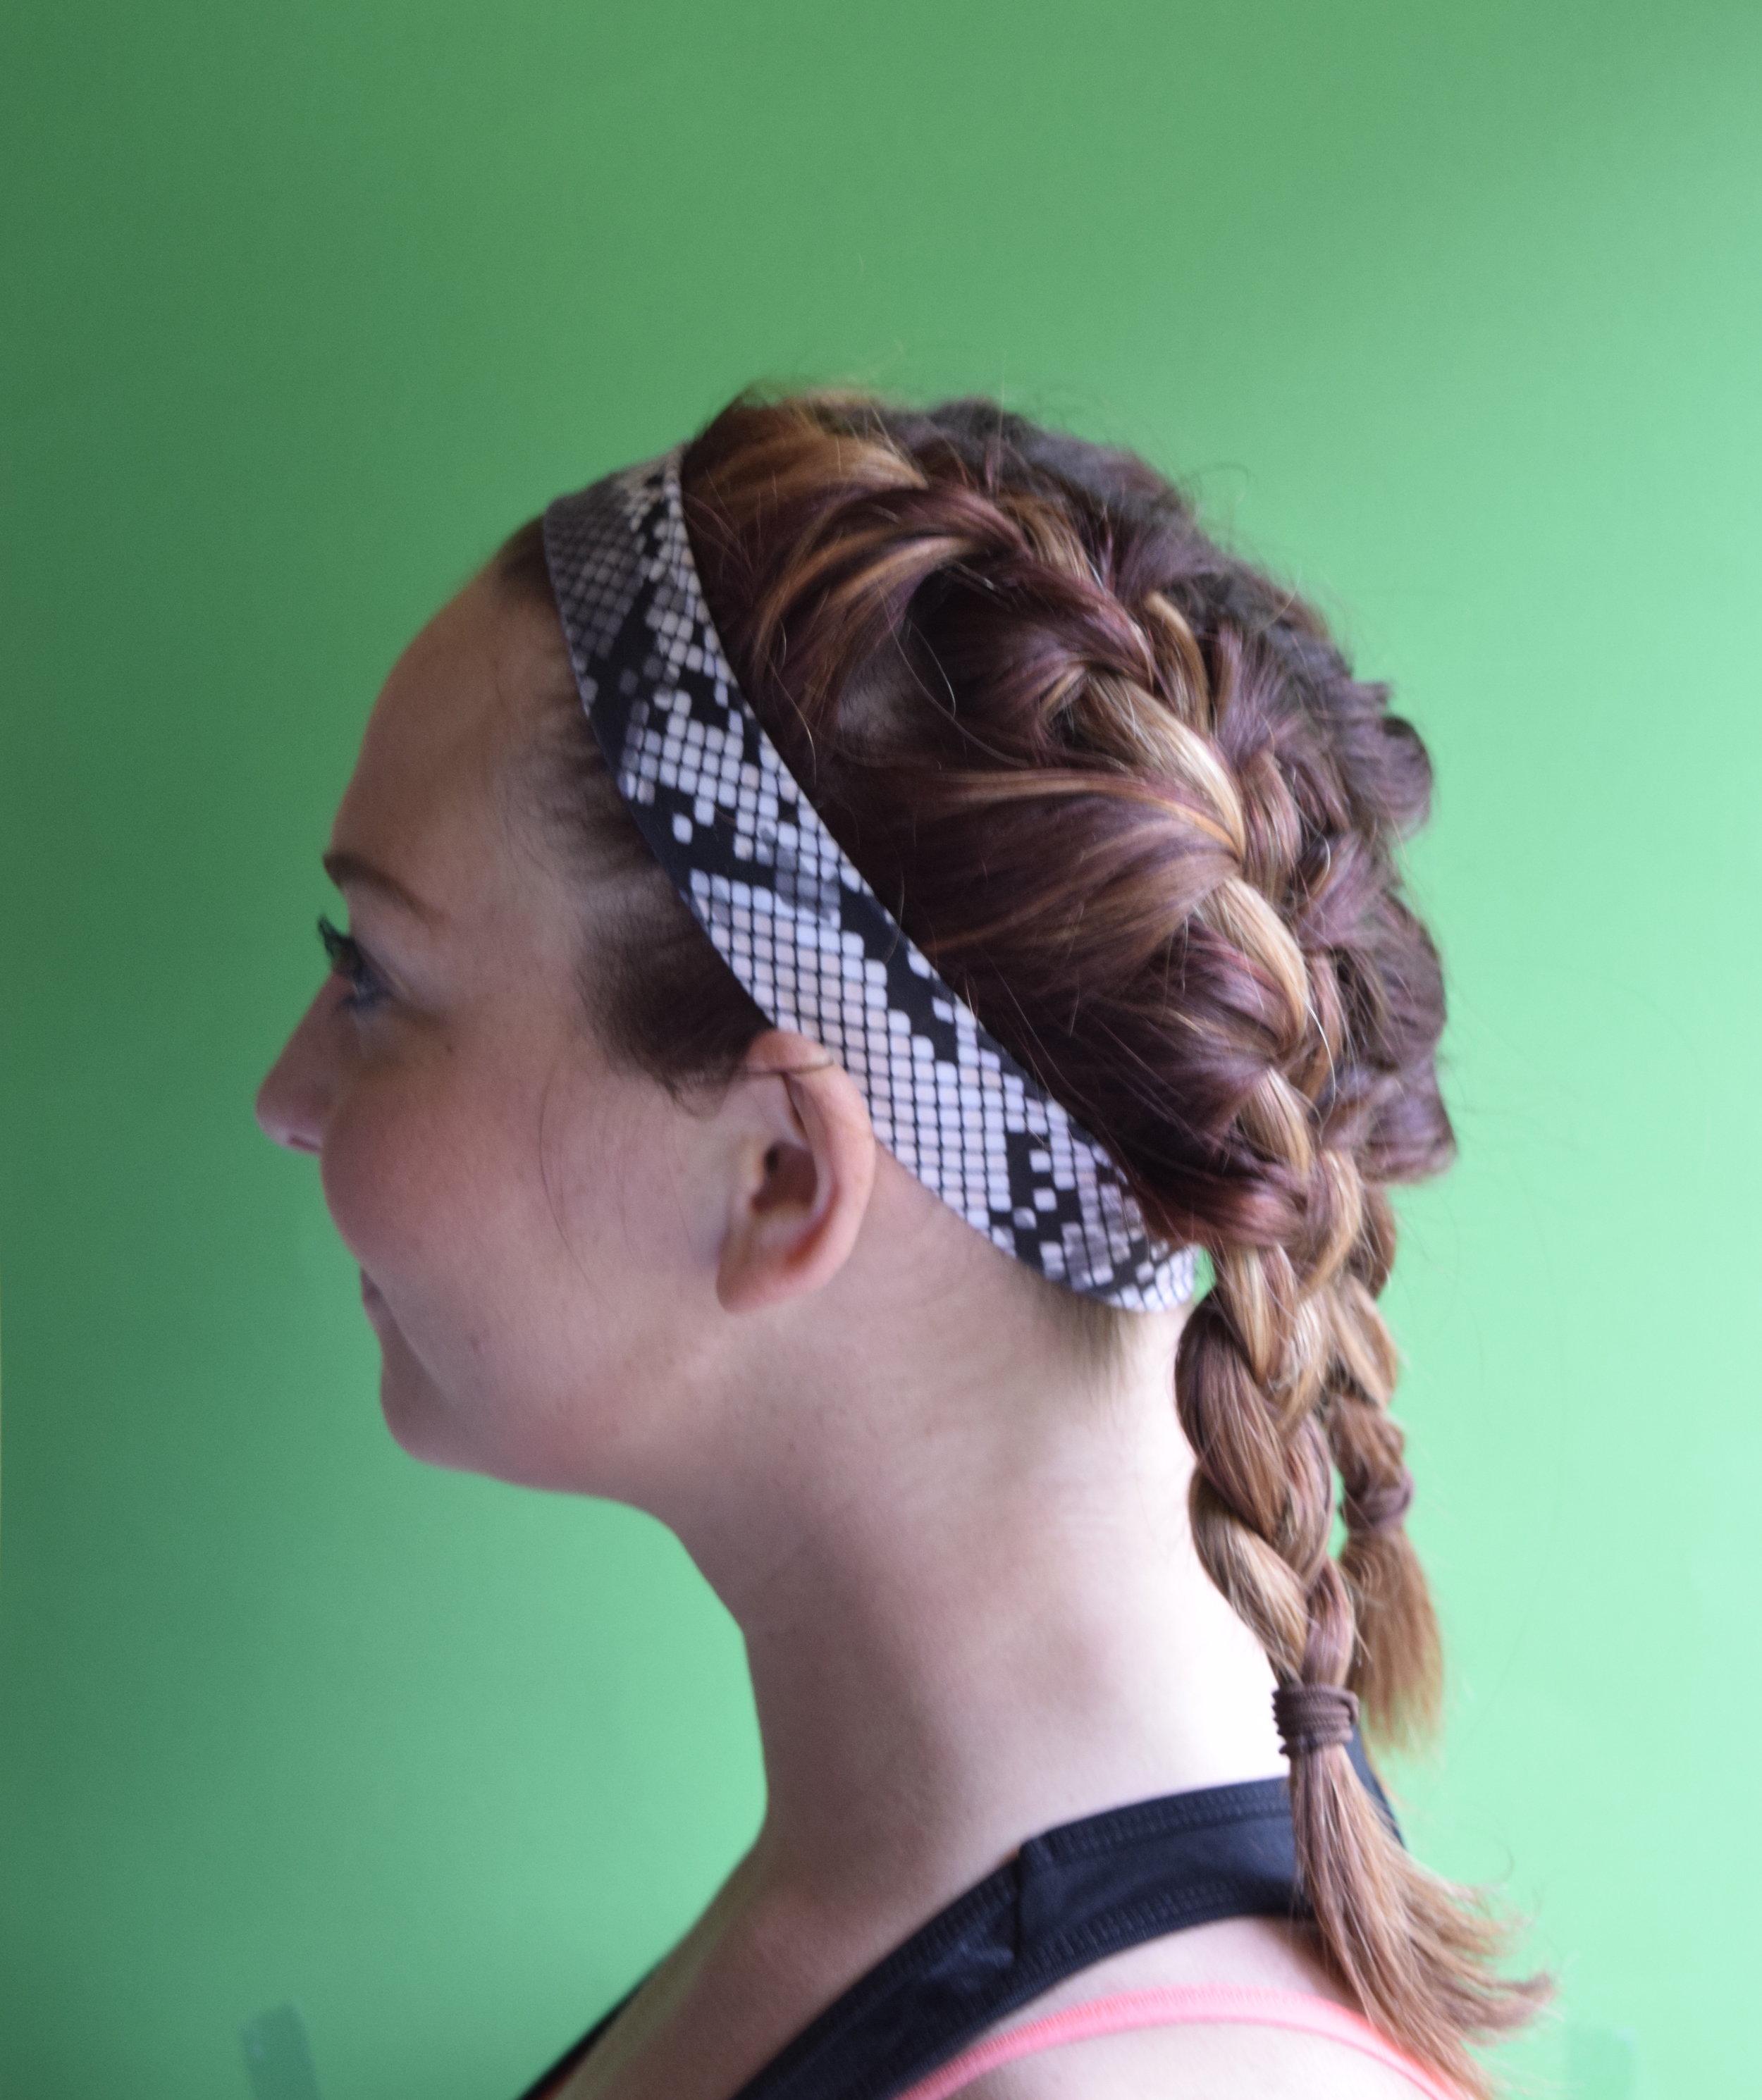 french braids profile.JPG